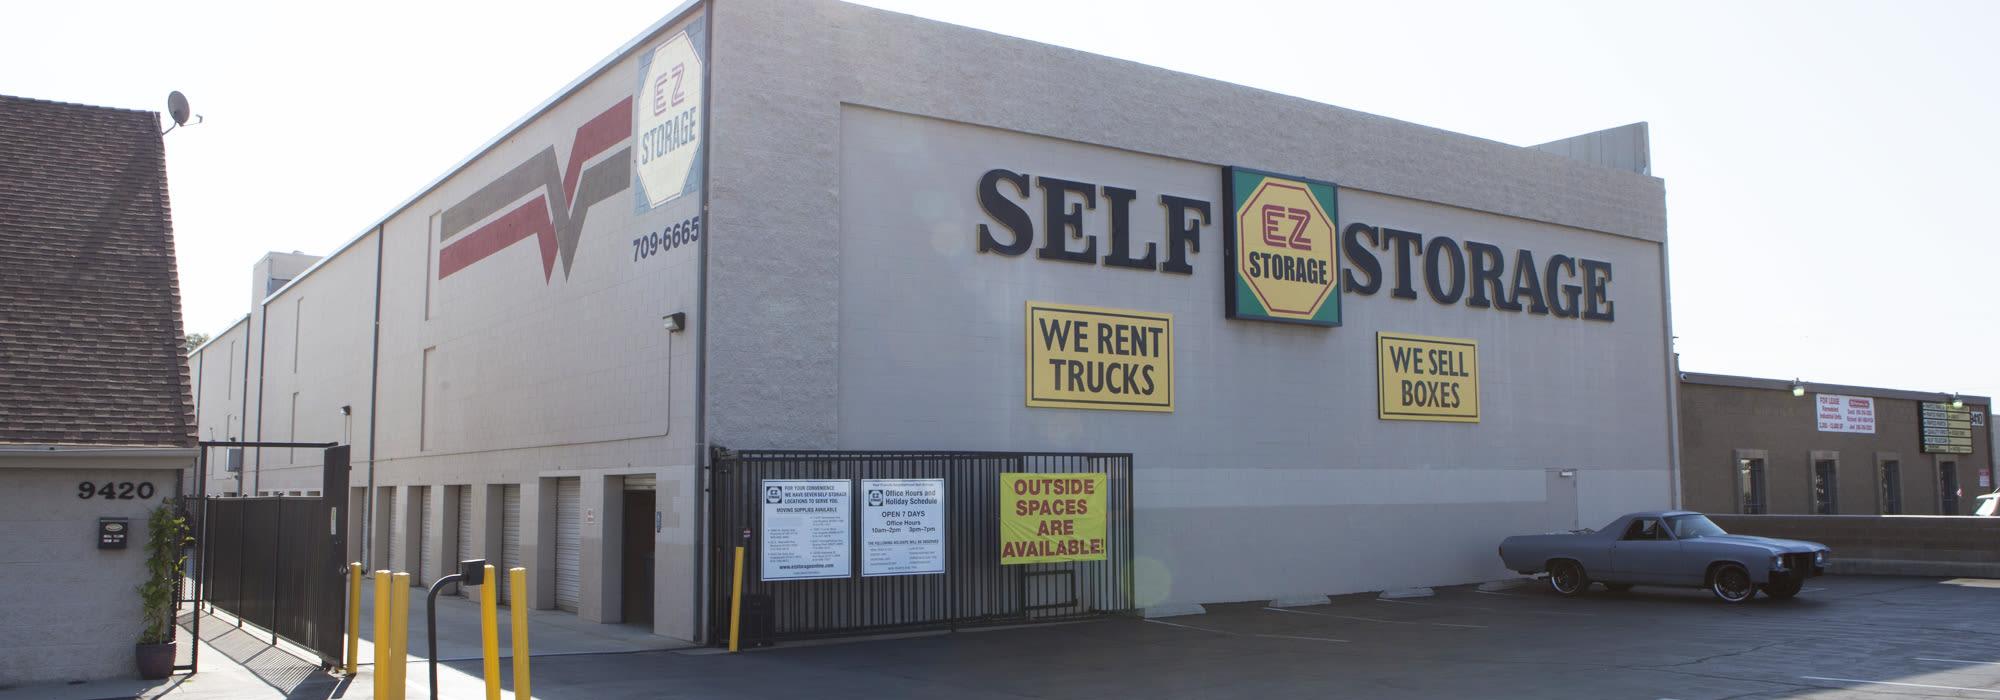 Self storage in Chatsworth CA